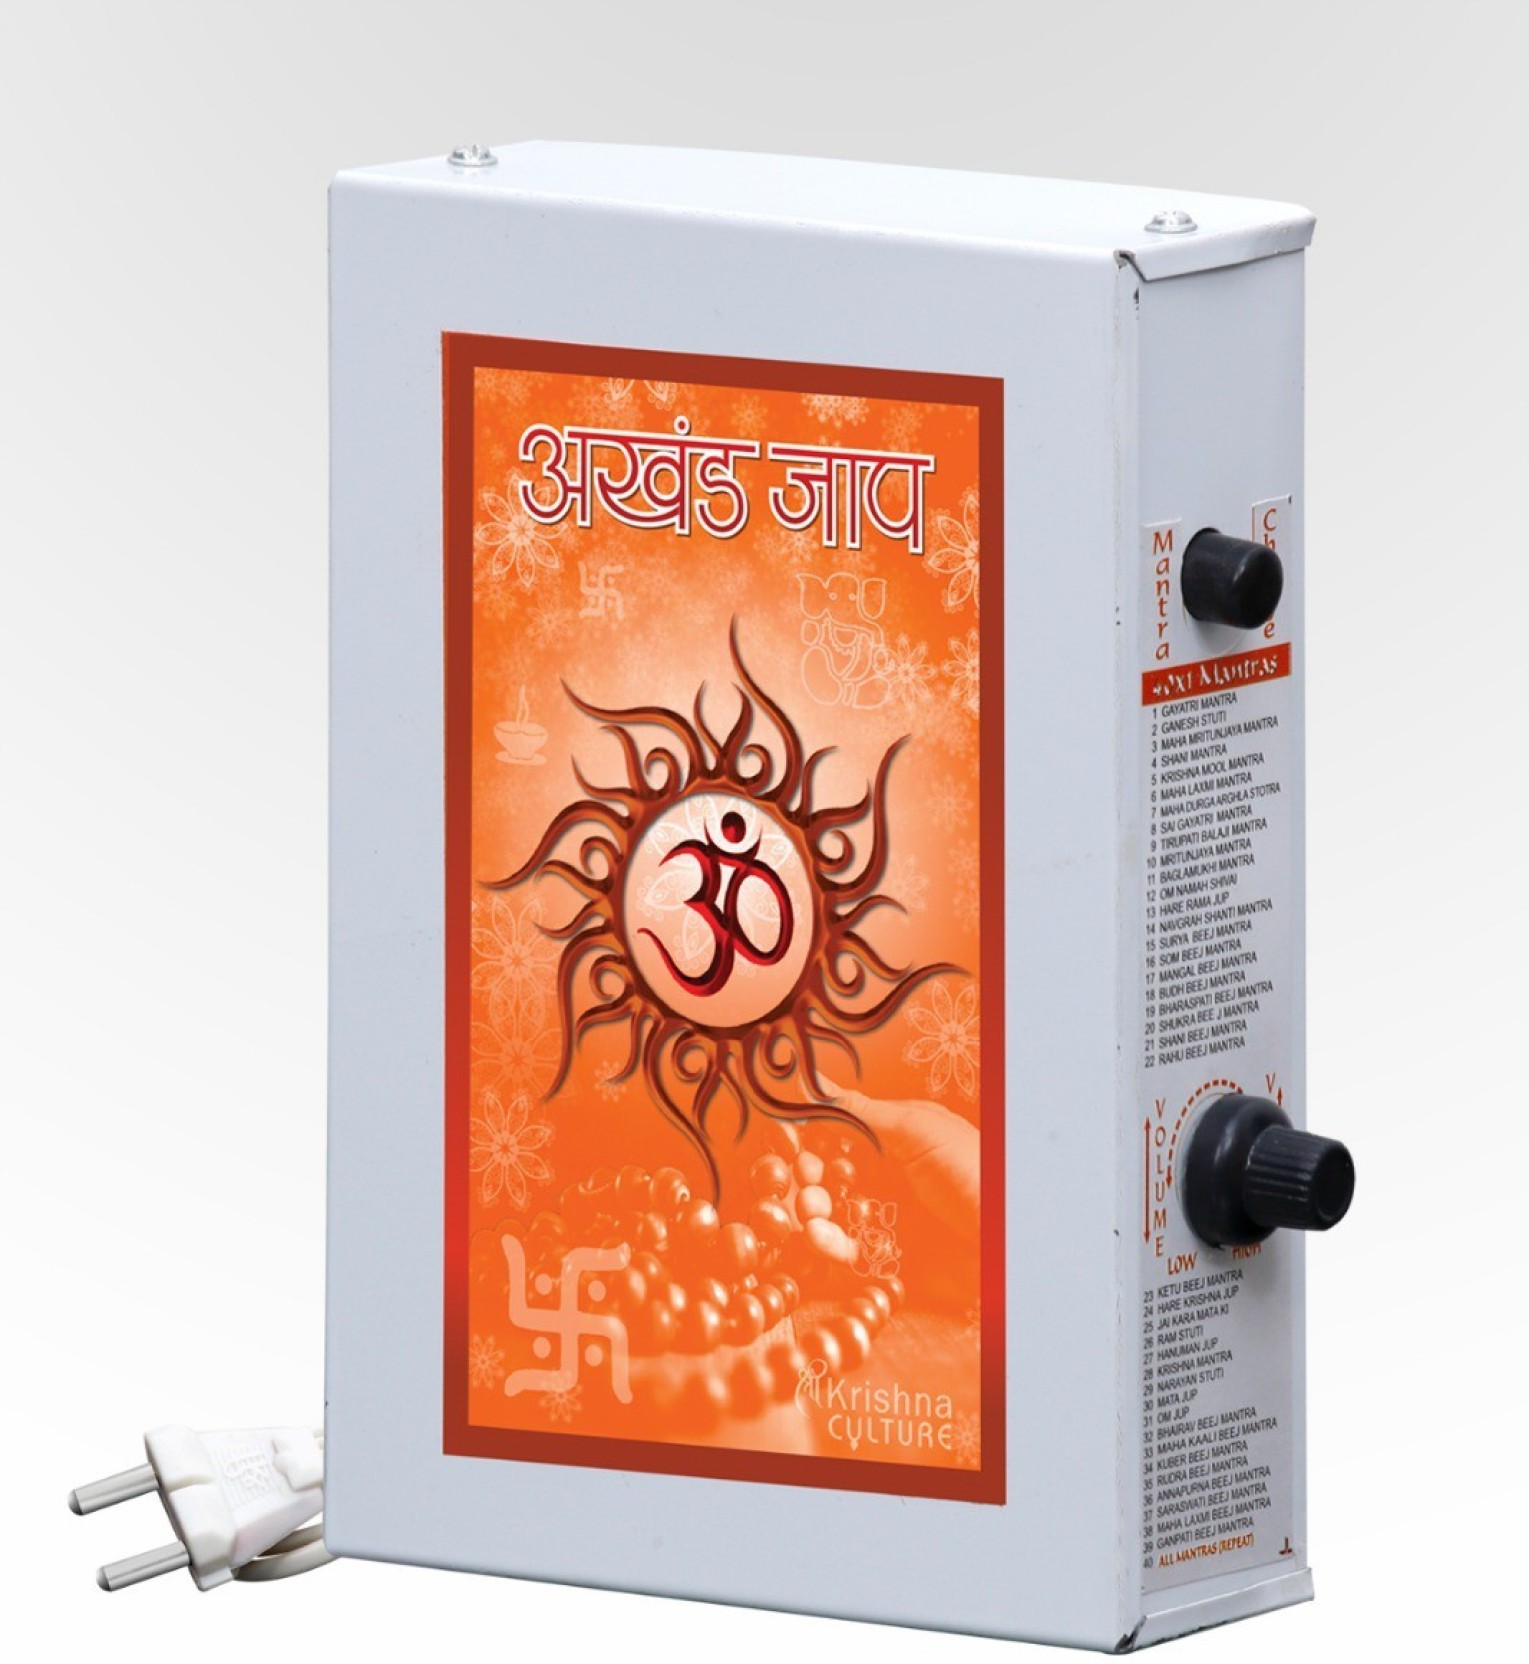 Sri Krishna Culture 40 in 1 ( All in 1) Mantra Chanting Box